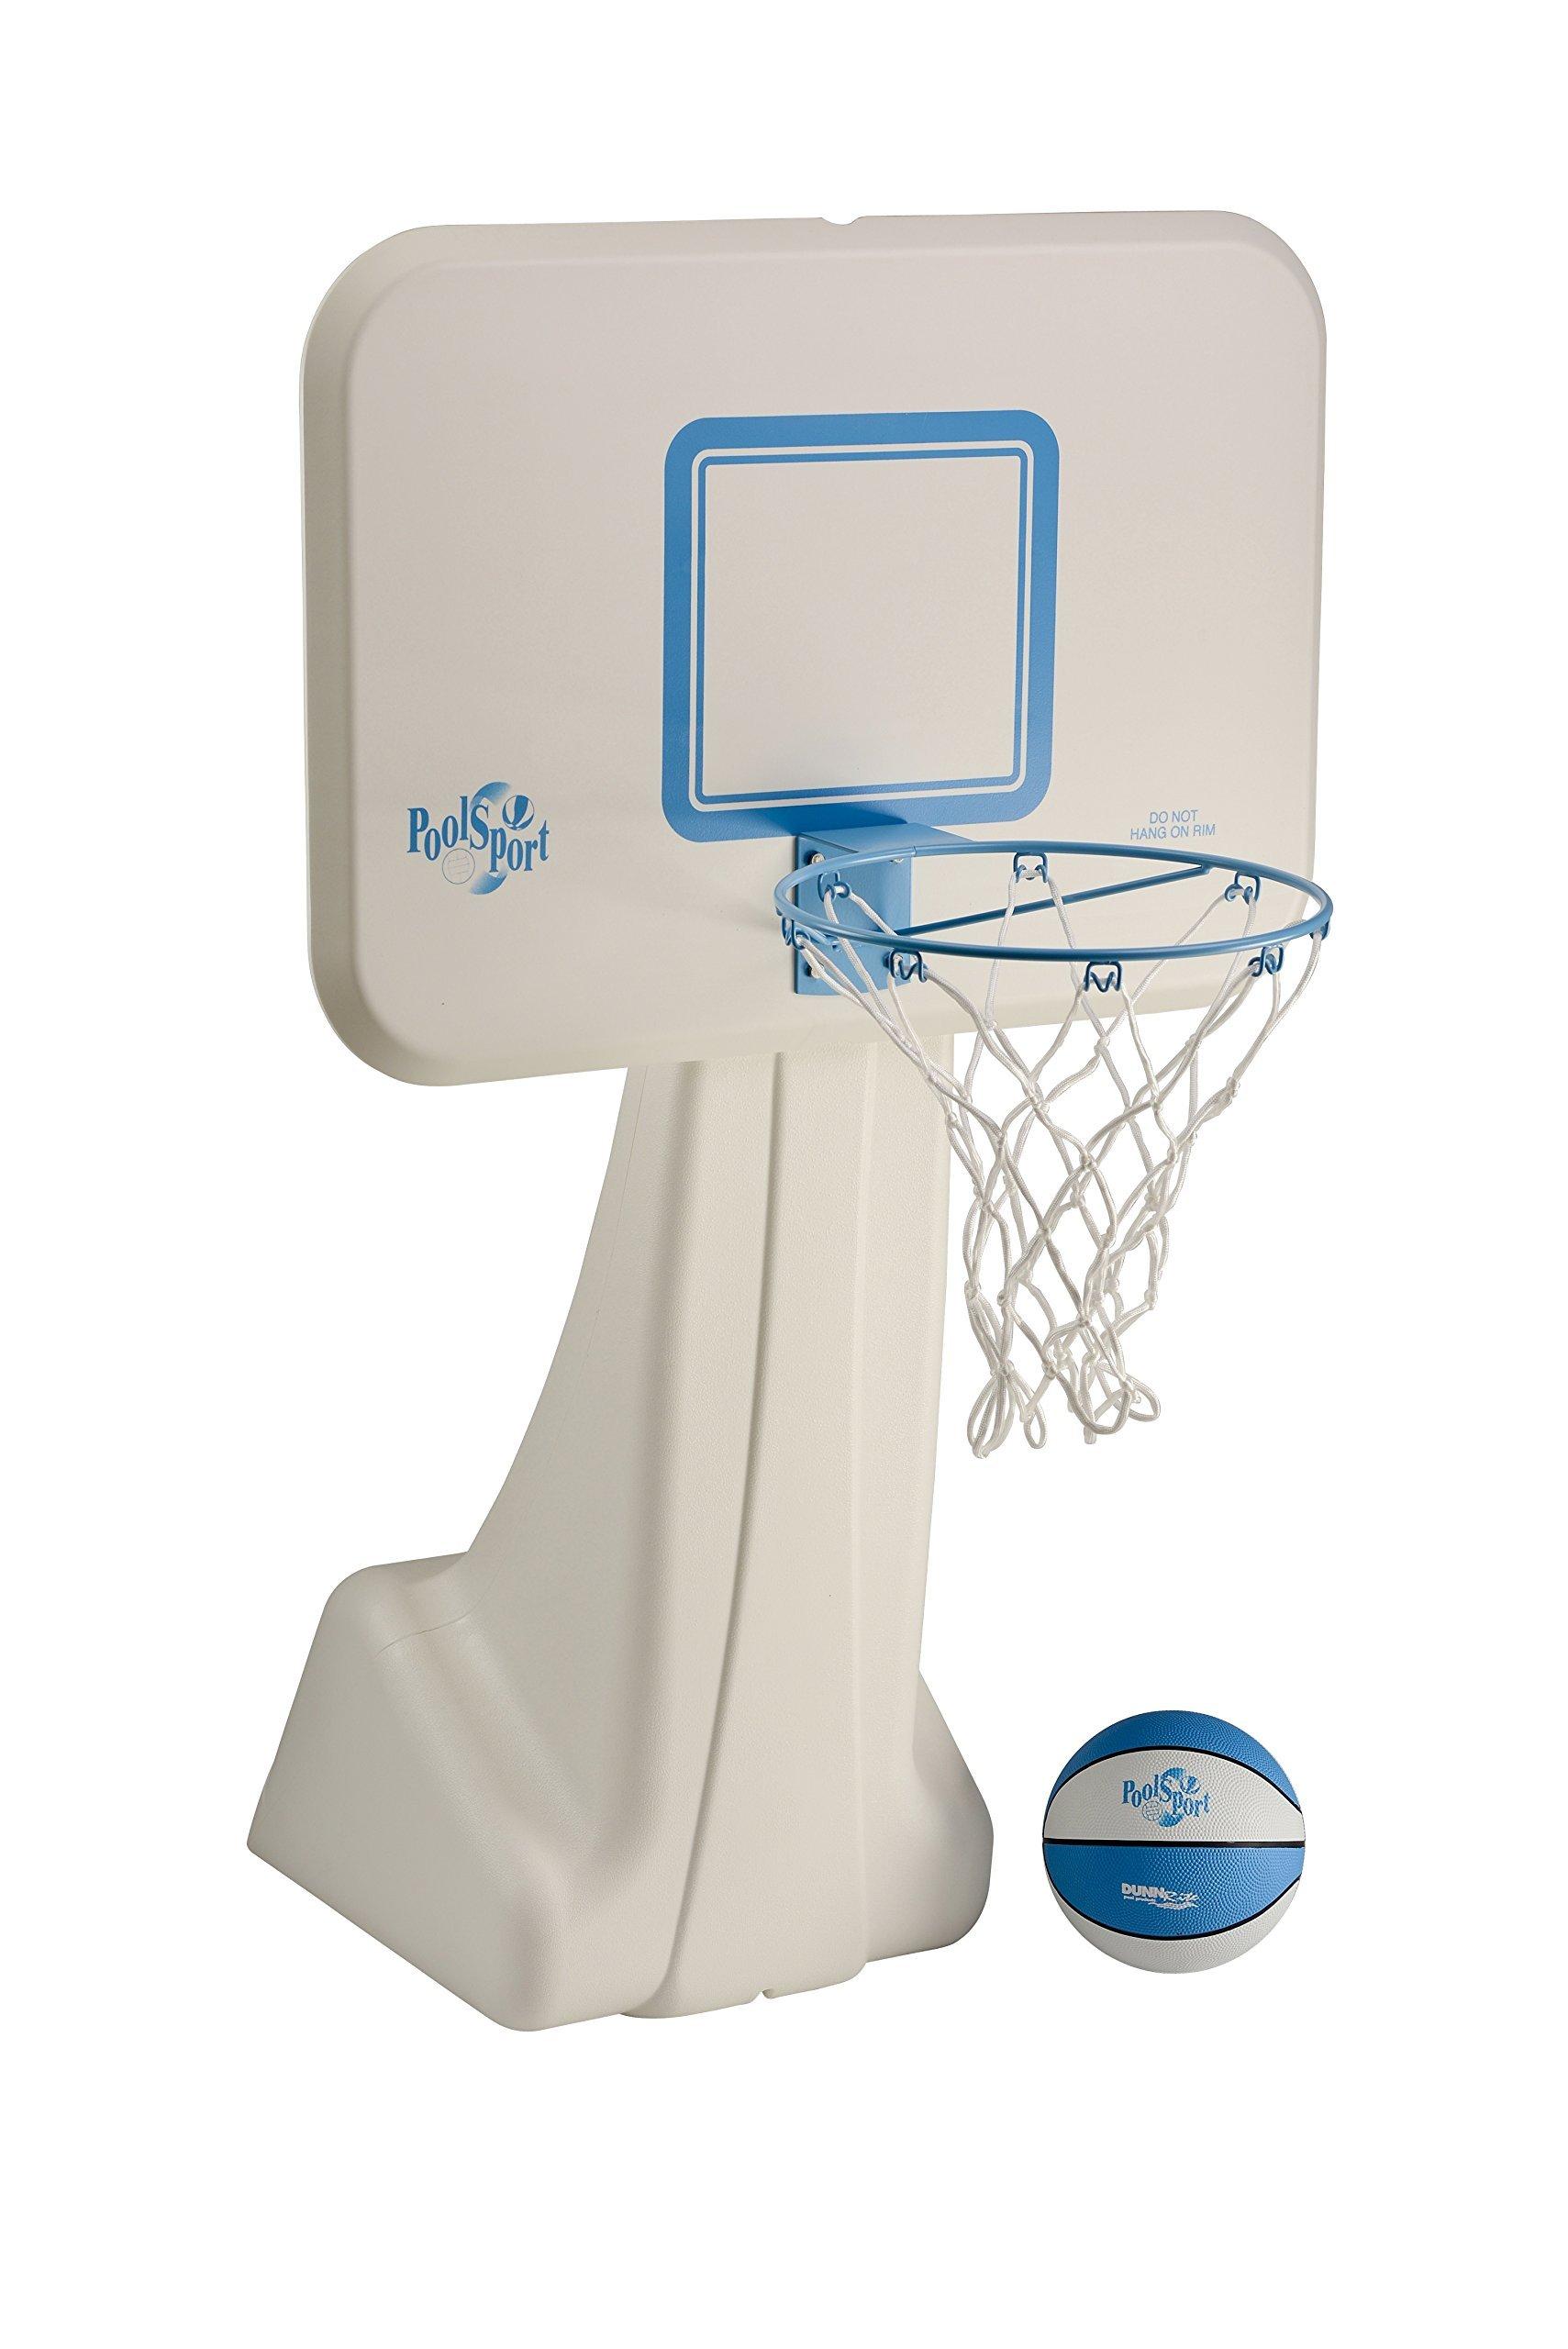 Dunnrite PoolSport pool basketball (B950) 13.5 inch stainless steel rim by Dunn Rite